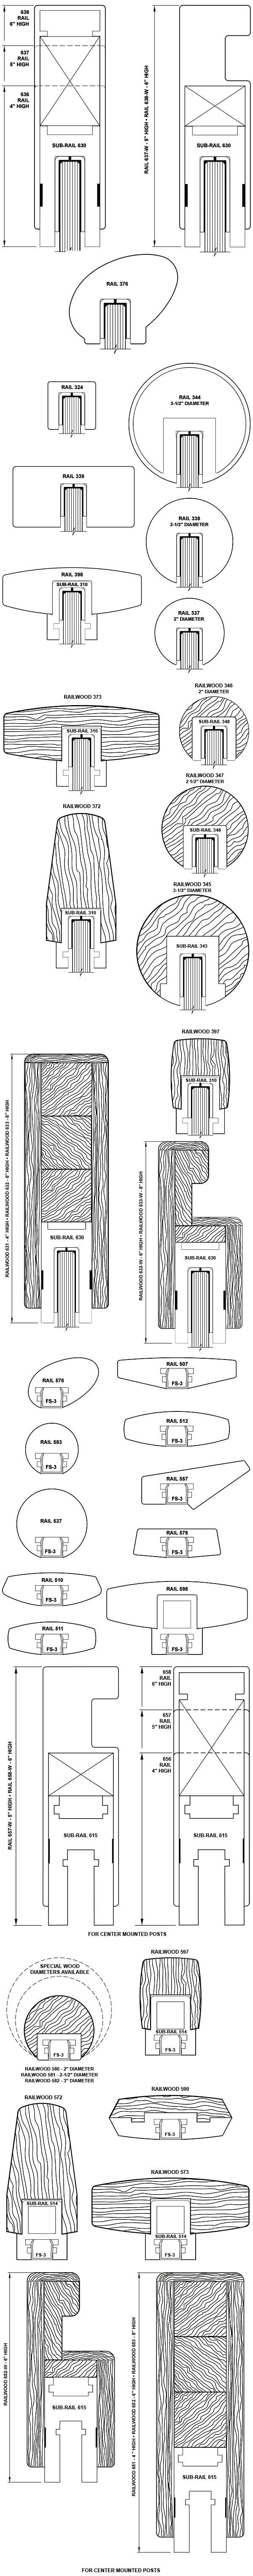 Aluminum and Railwood Handrails